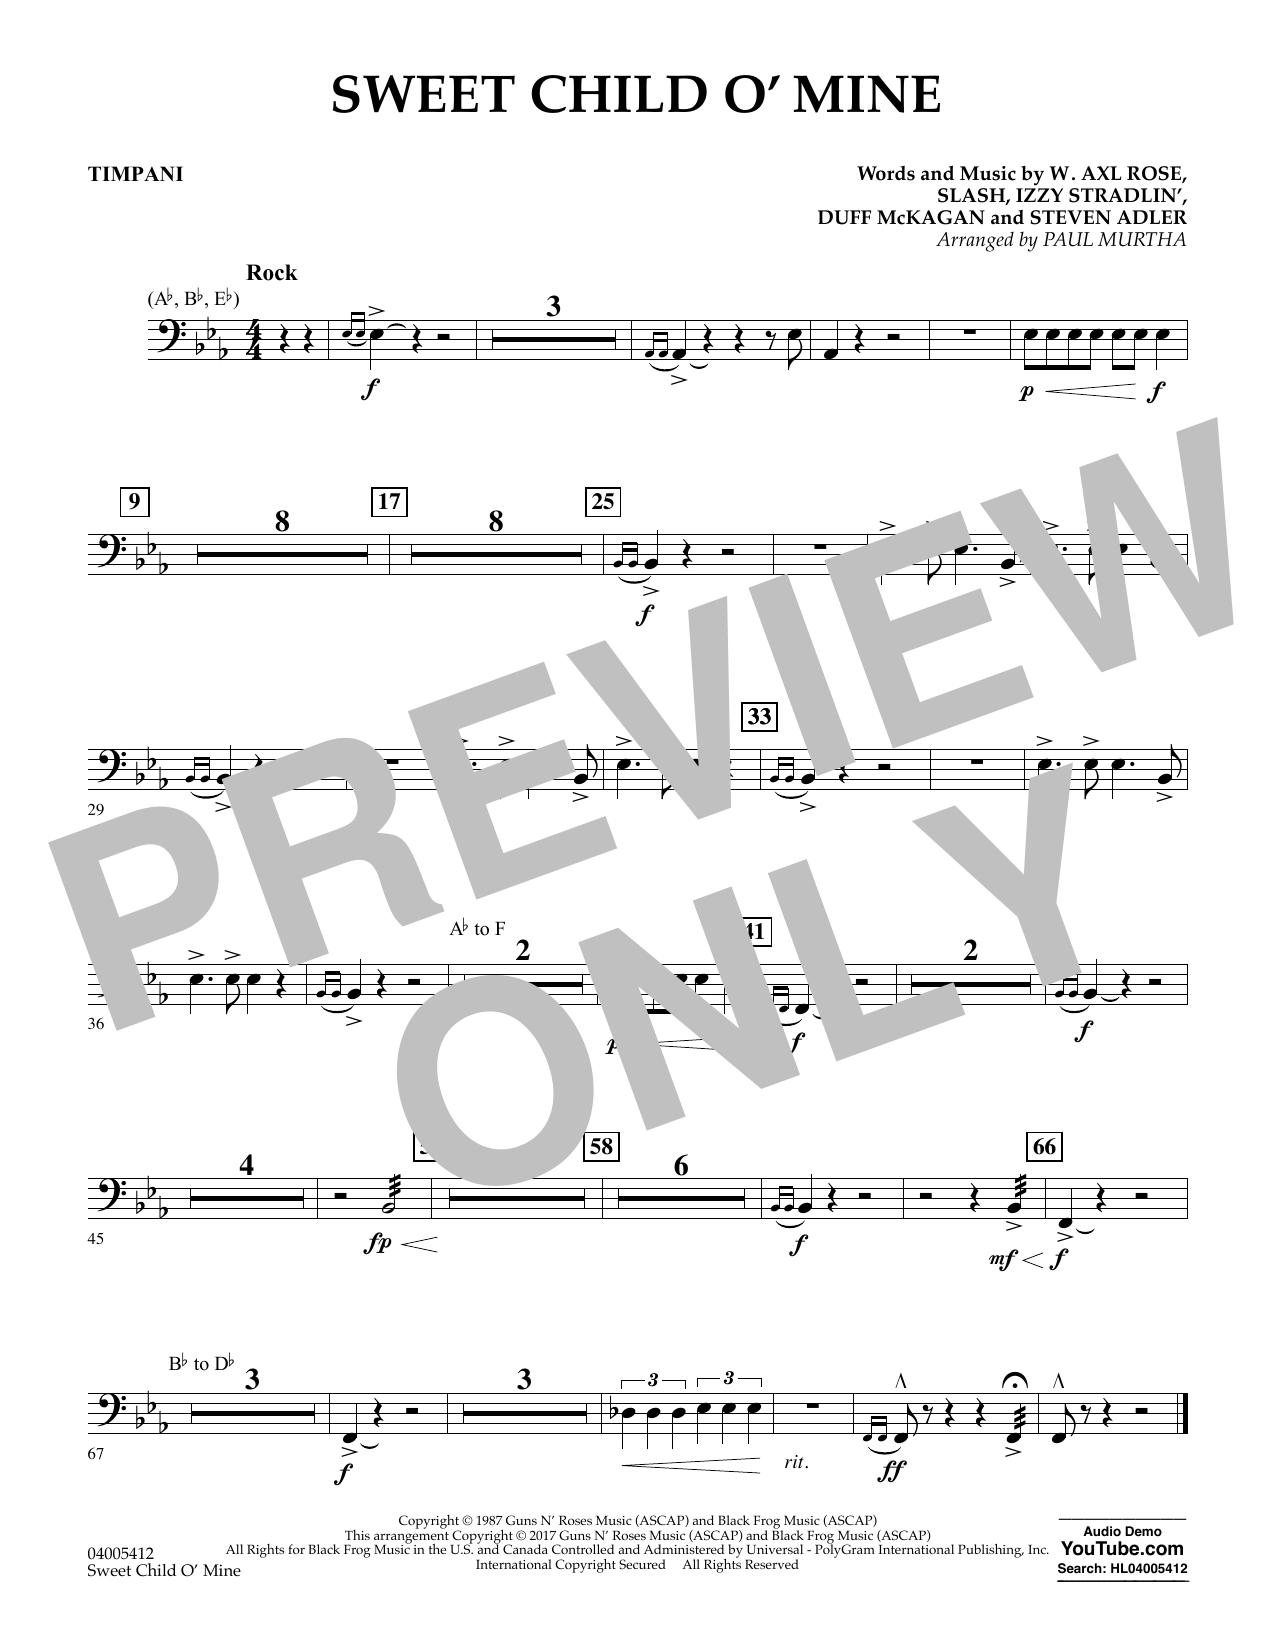 Sweet Child o' Mine - Timpani (Concert Band)